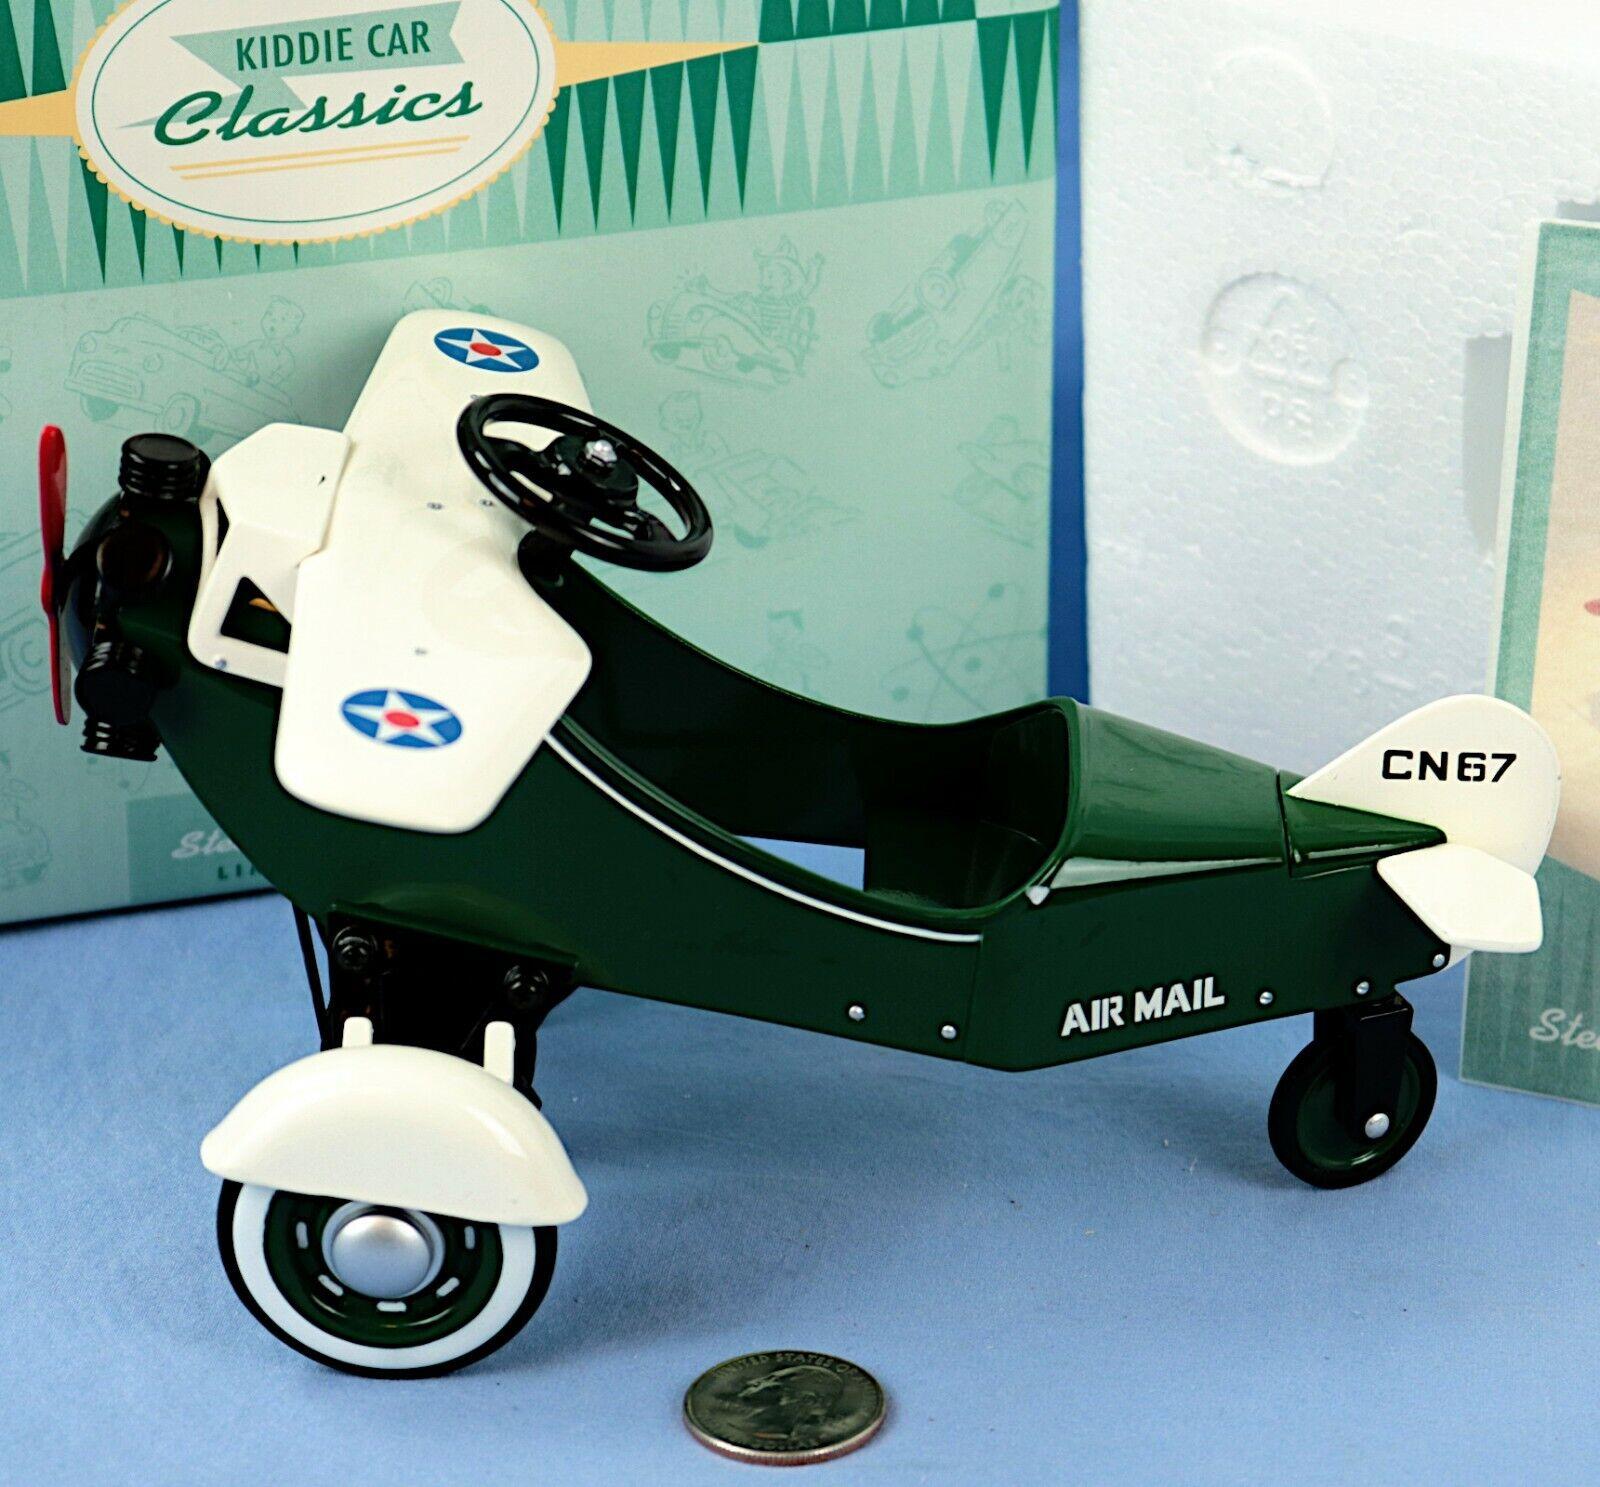 Hallmark Kiddie Car Classics Replica 1935 Murray Steelcraft Airplane 4